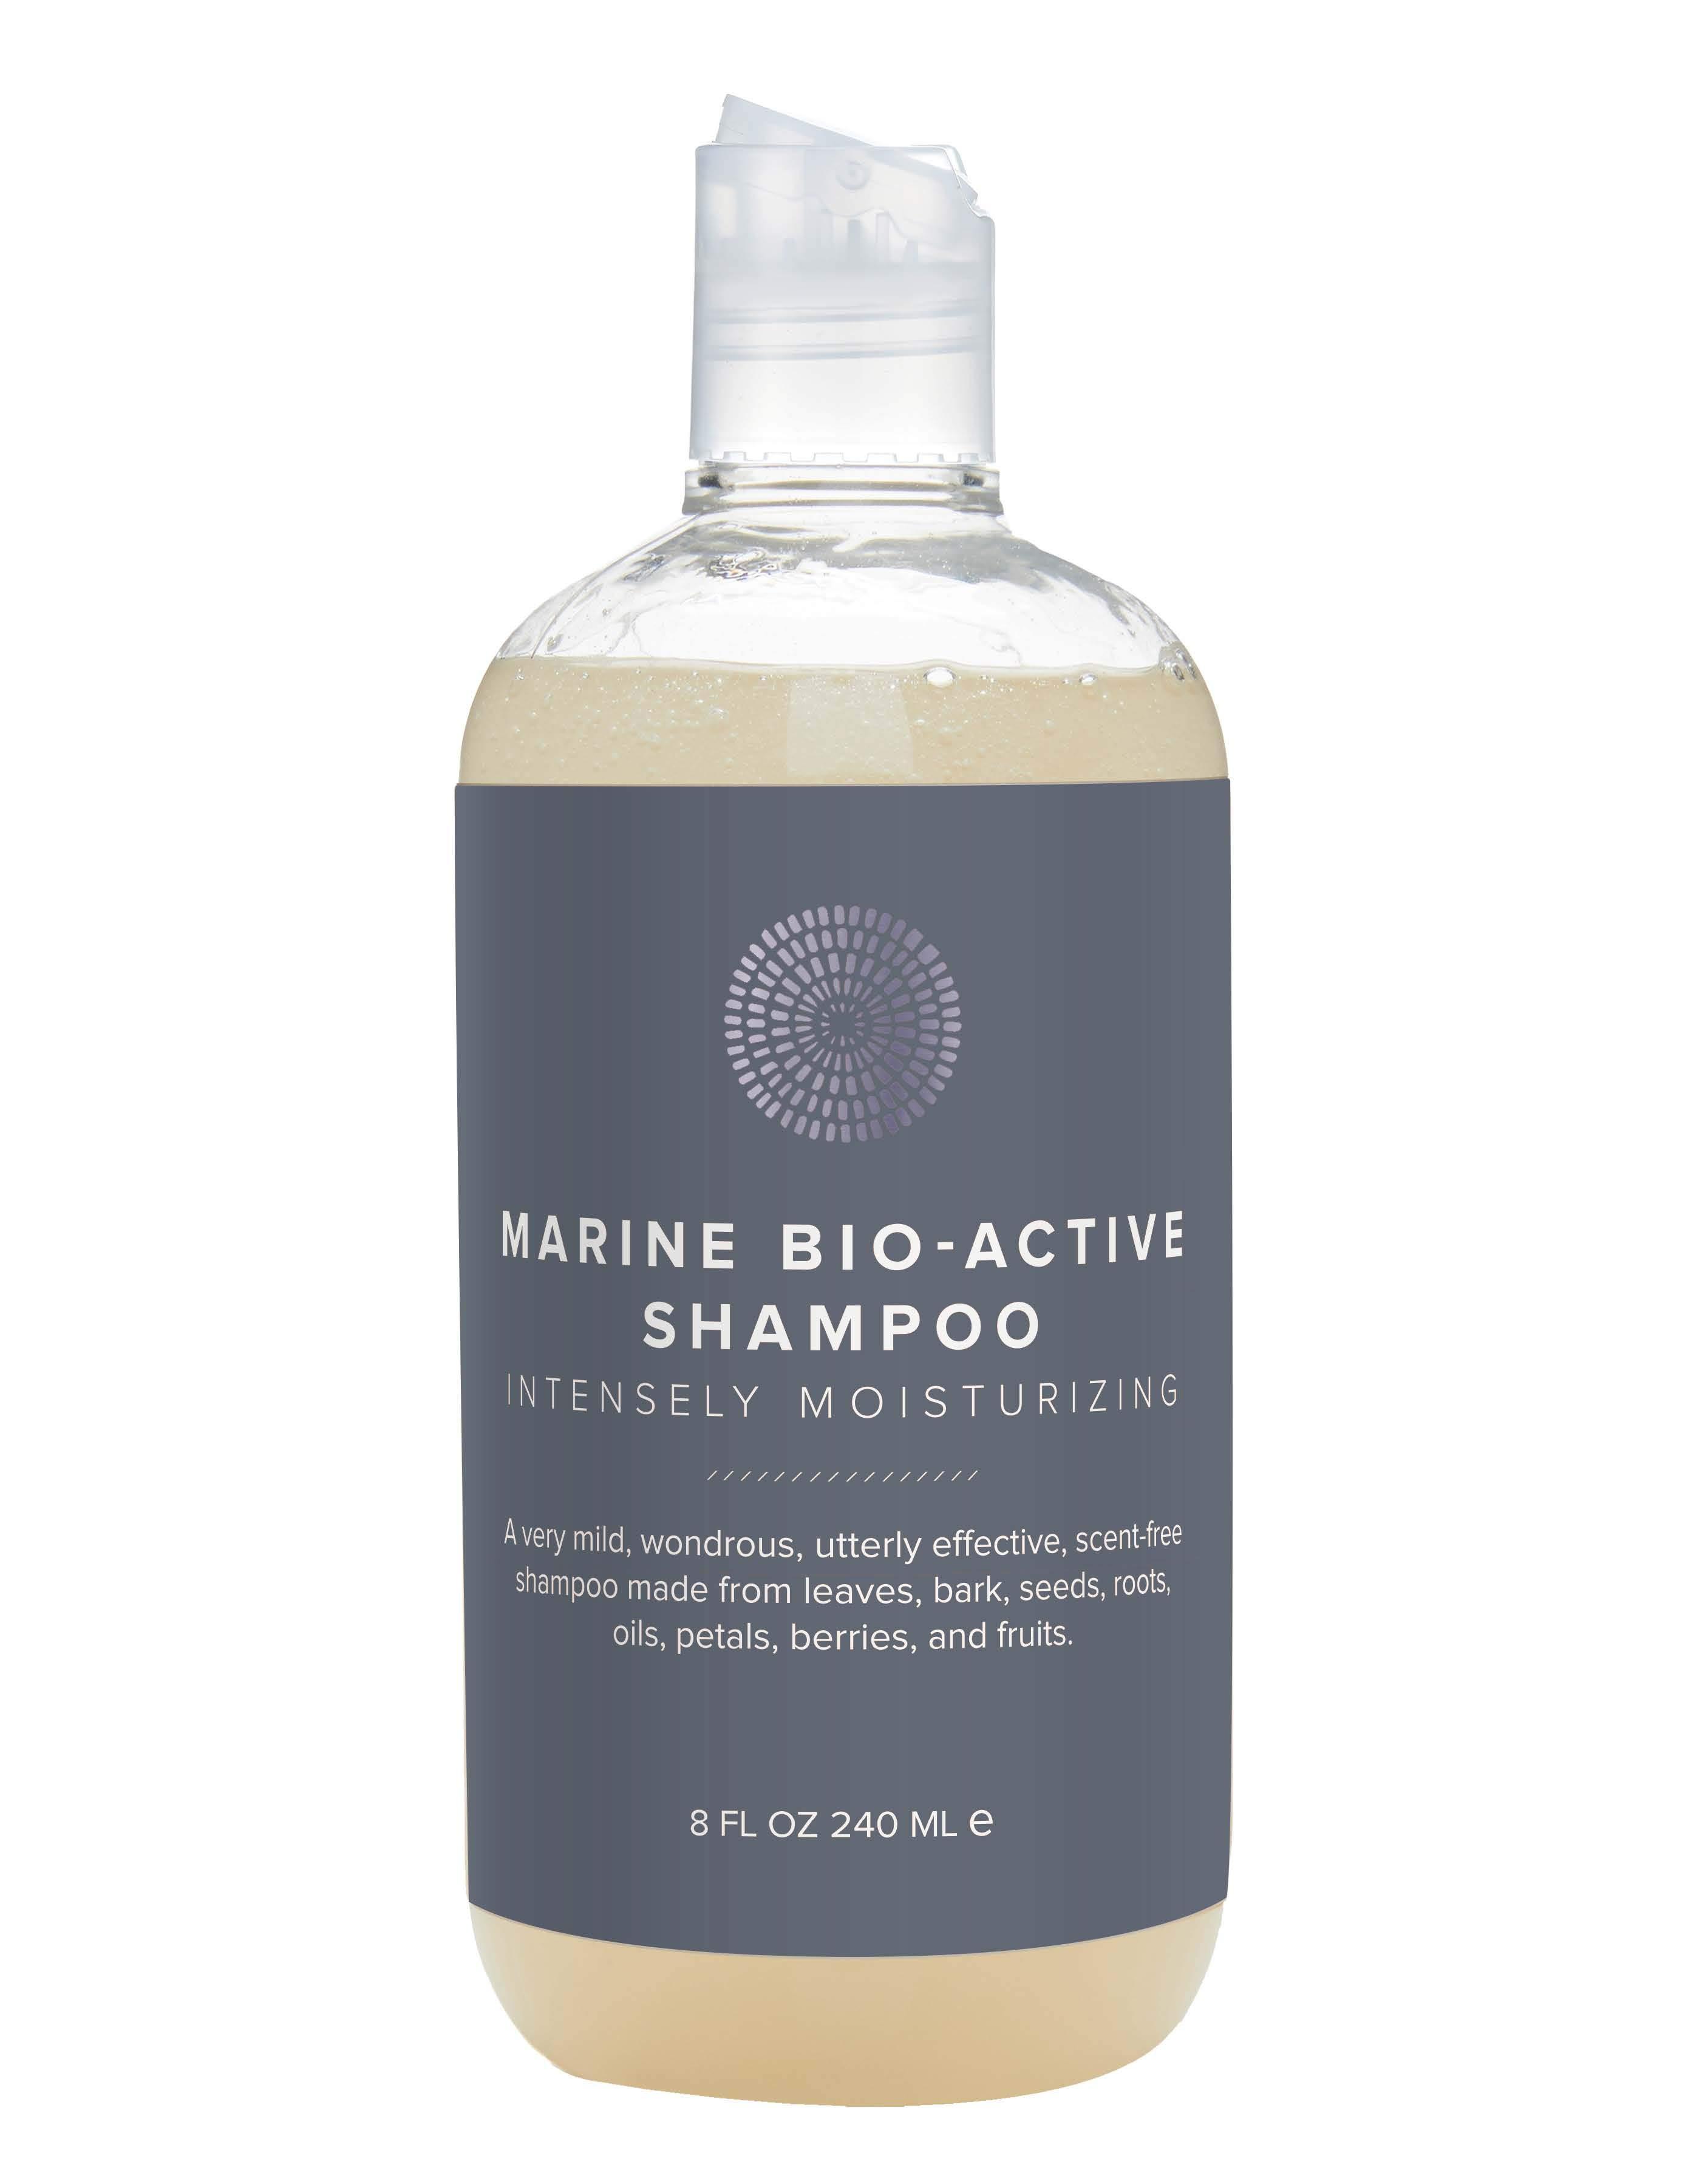 Marine BioActive Shampoo Shampoo, Scent free shampoo